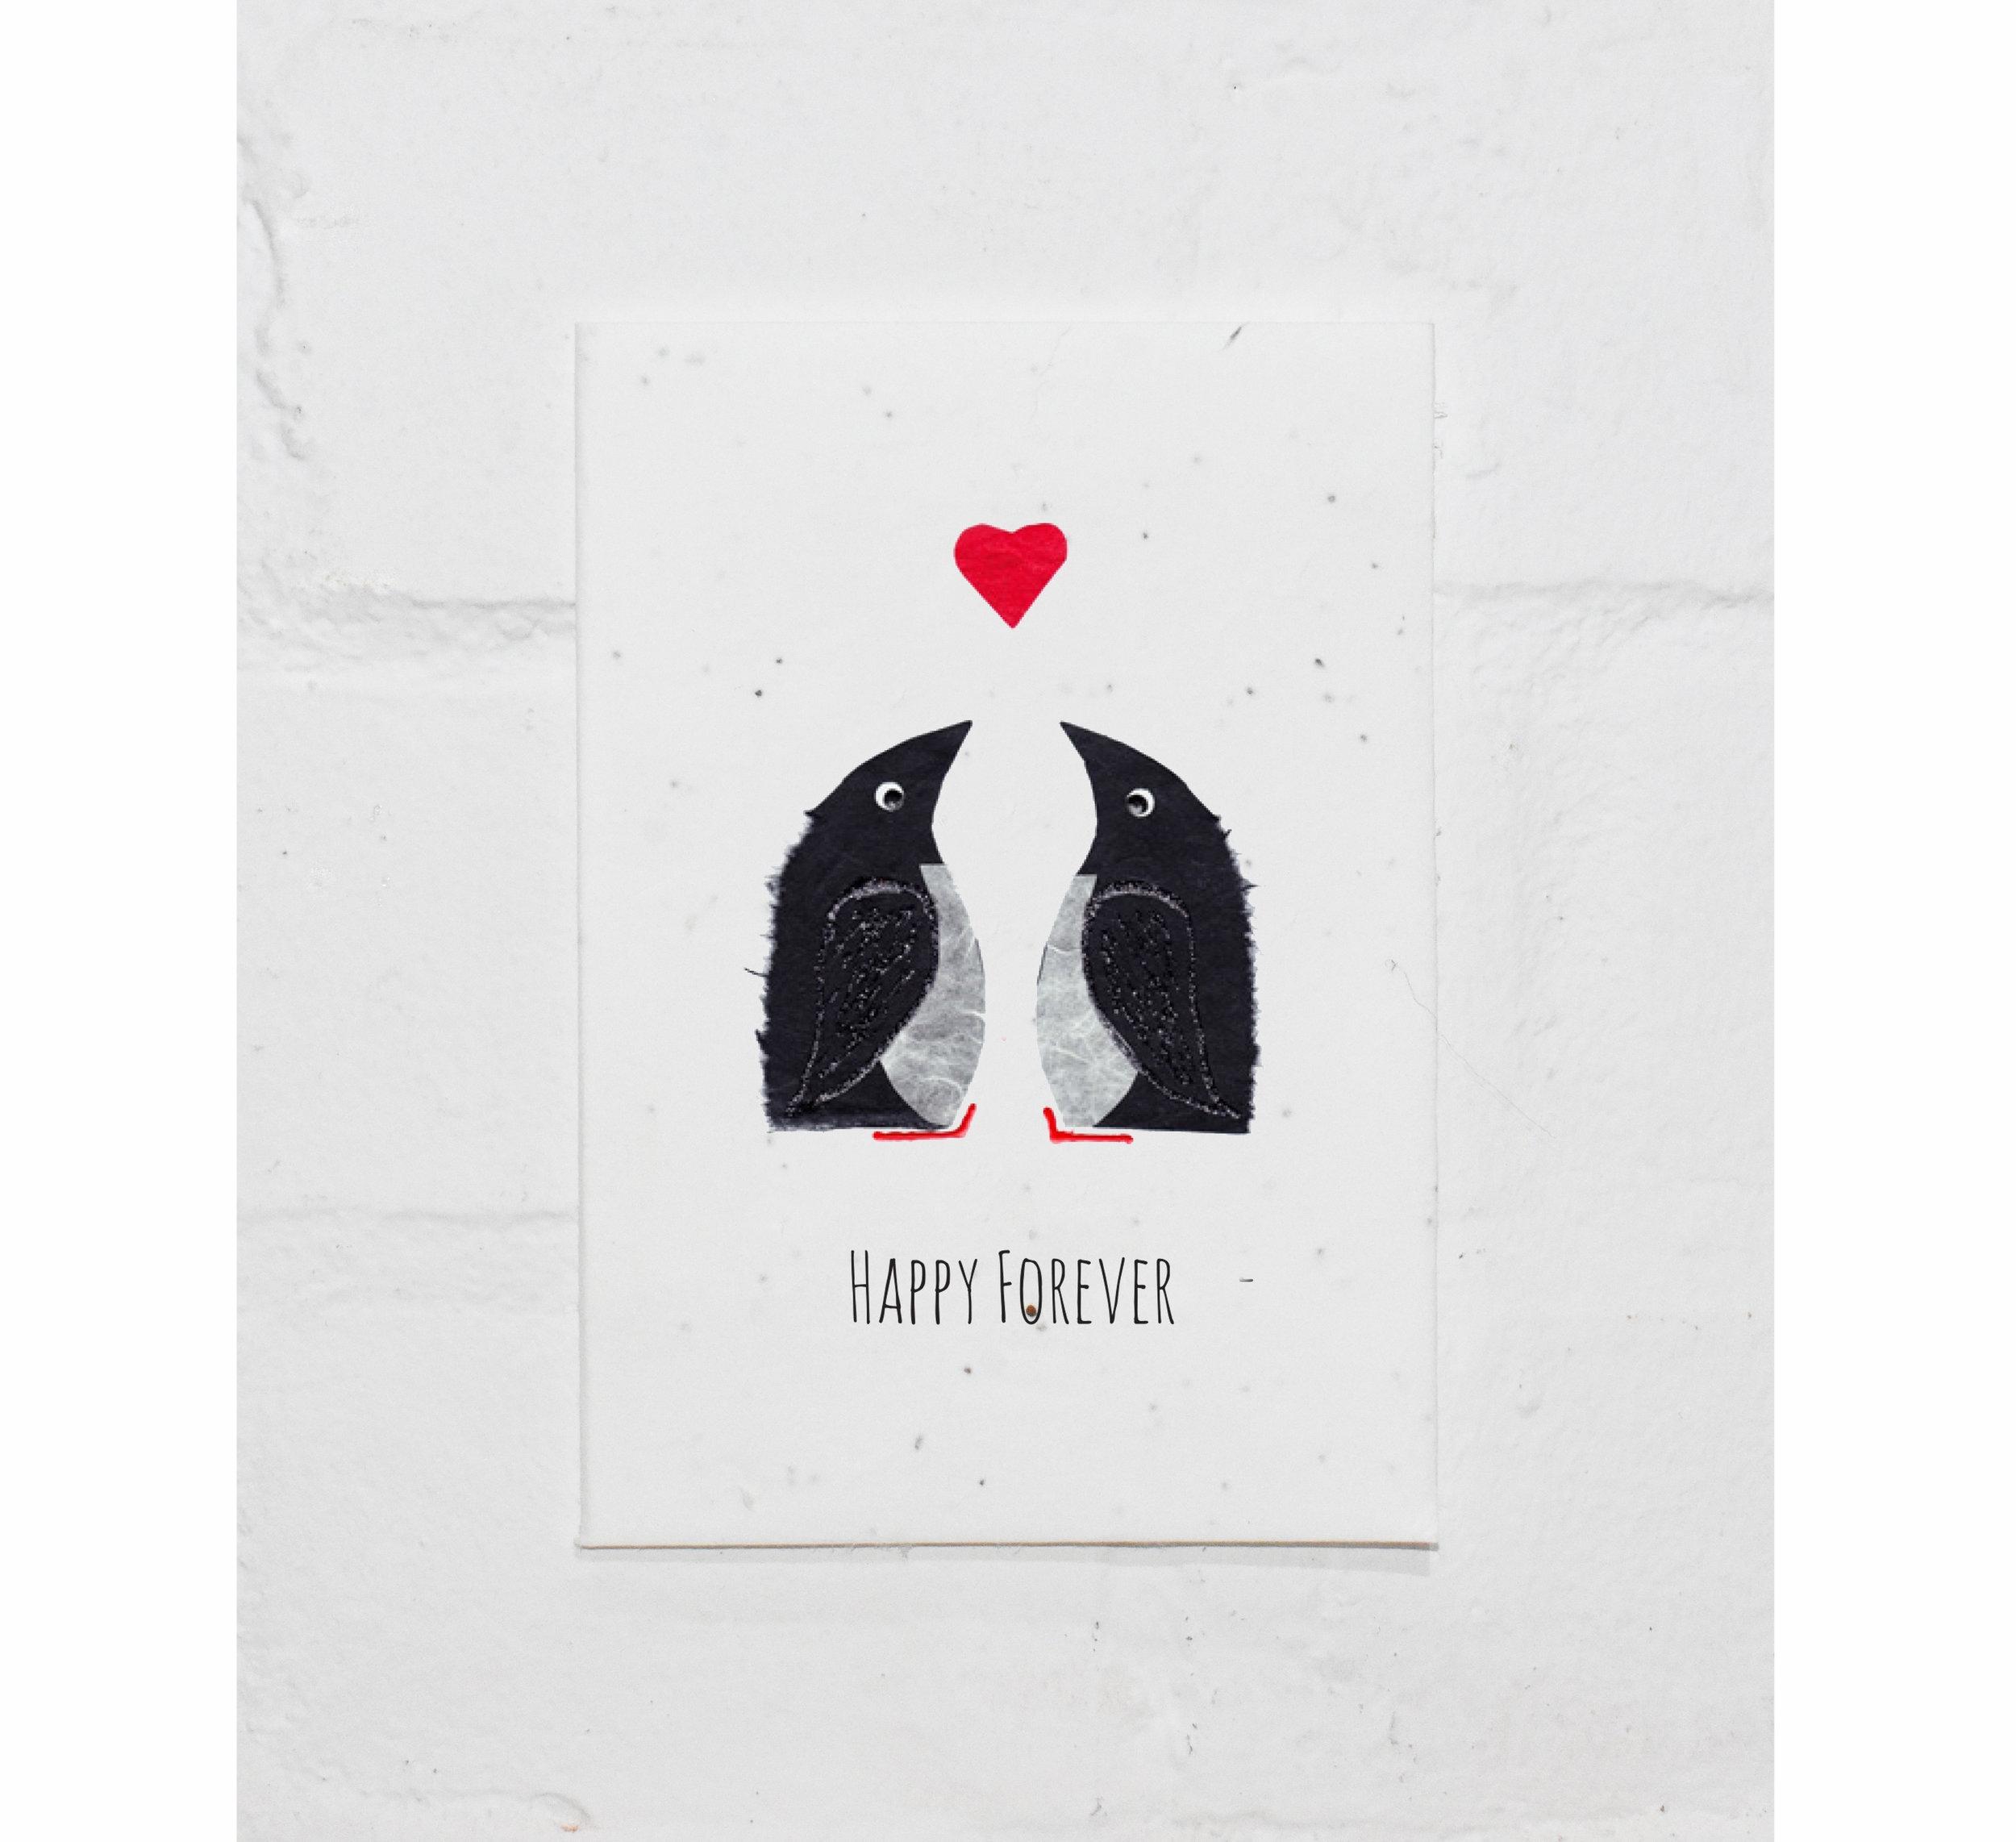 Penguin_wedding_card.jpg